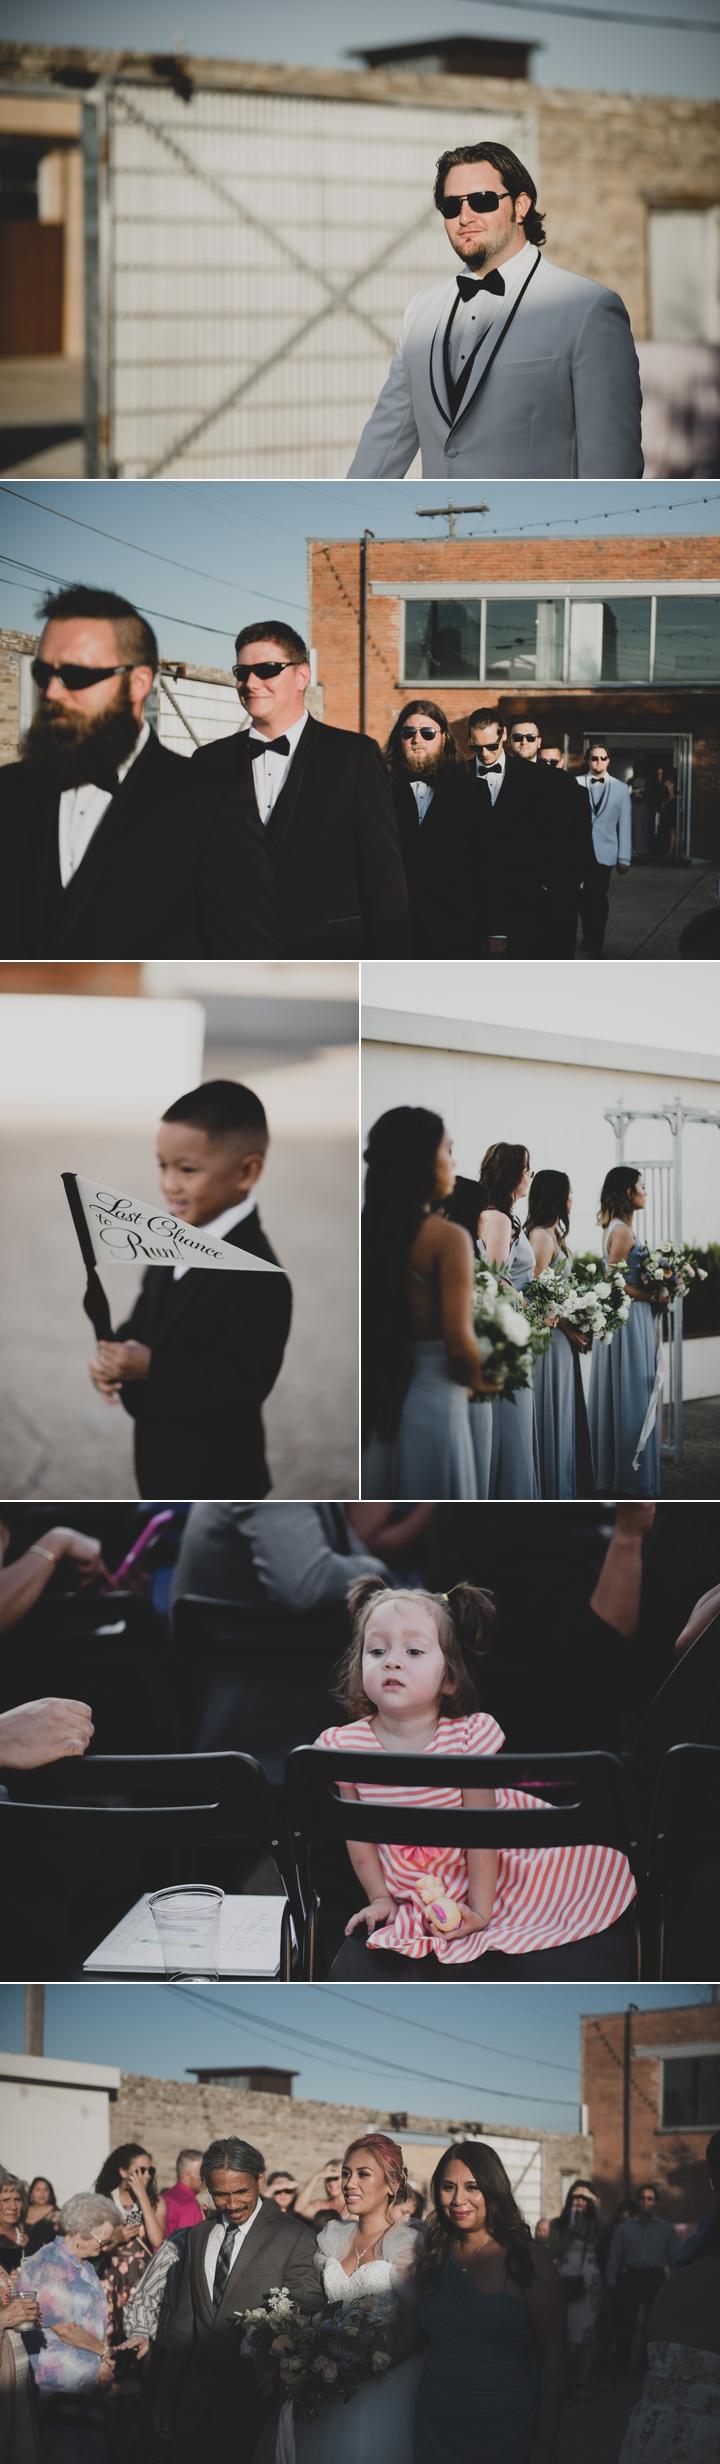 dallas-wedding-photographers-sj2 23.jpg